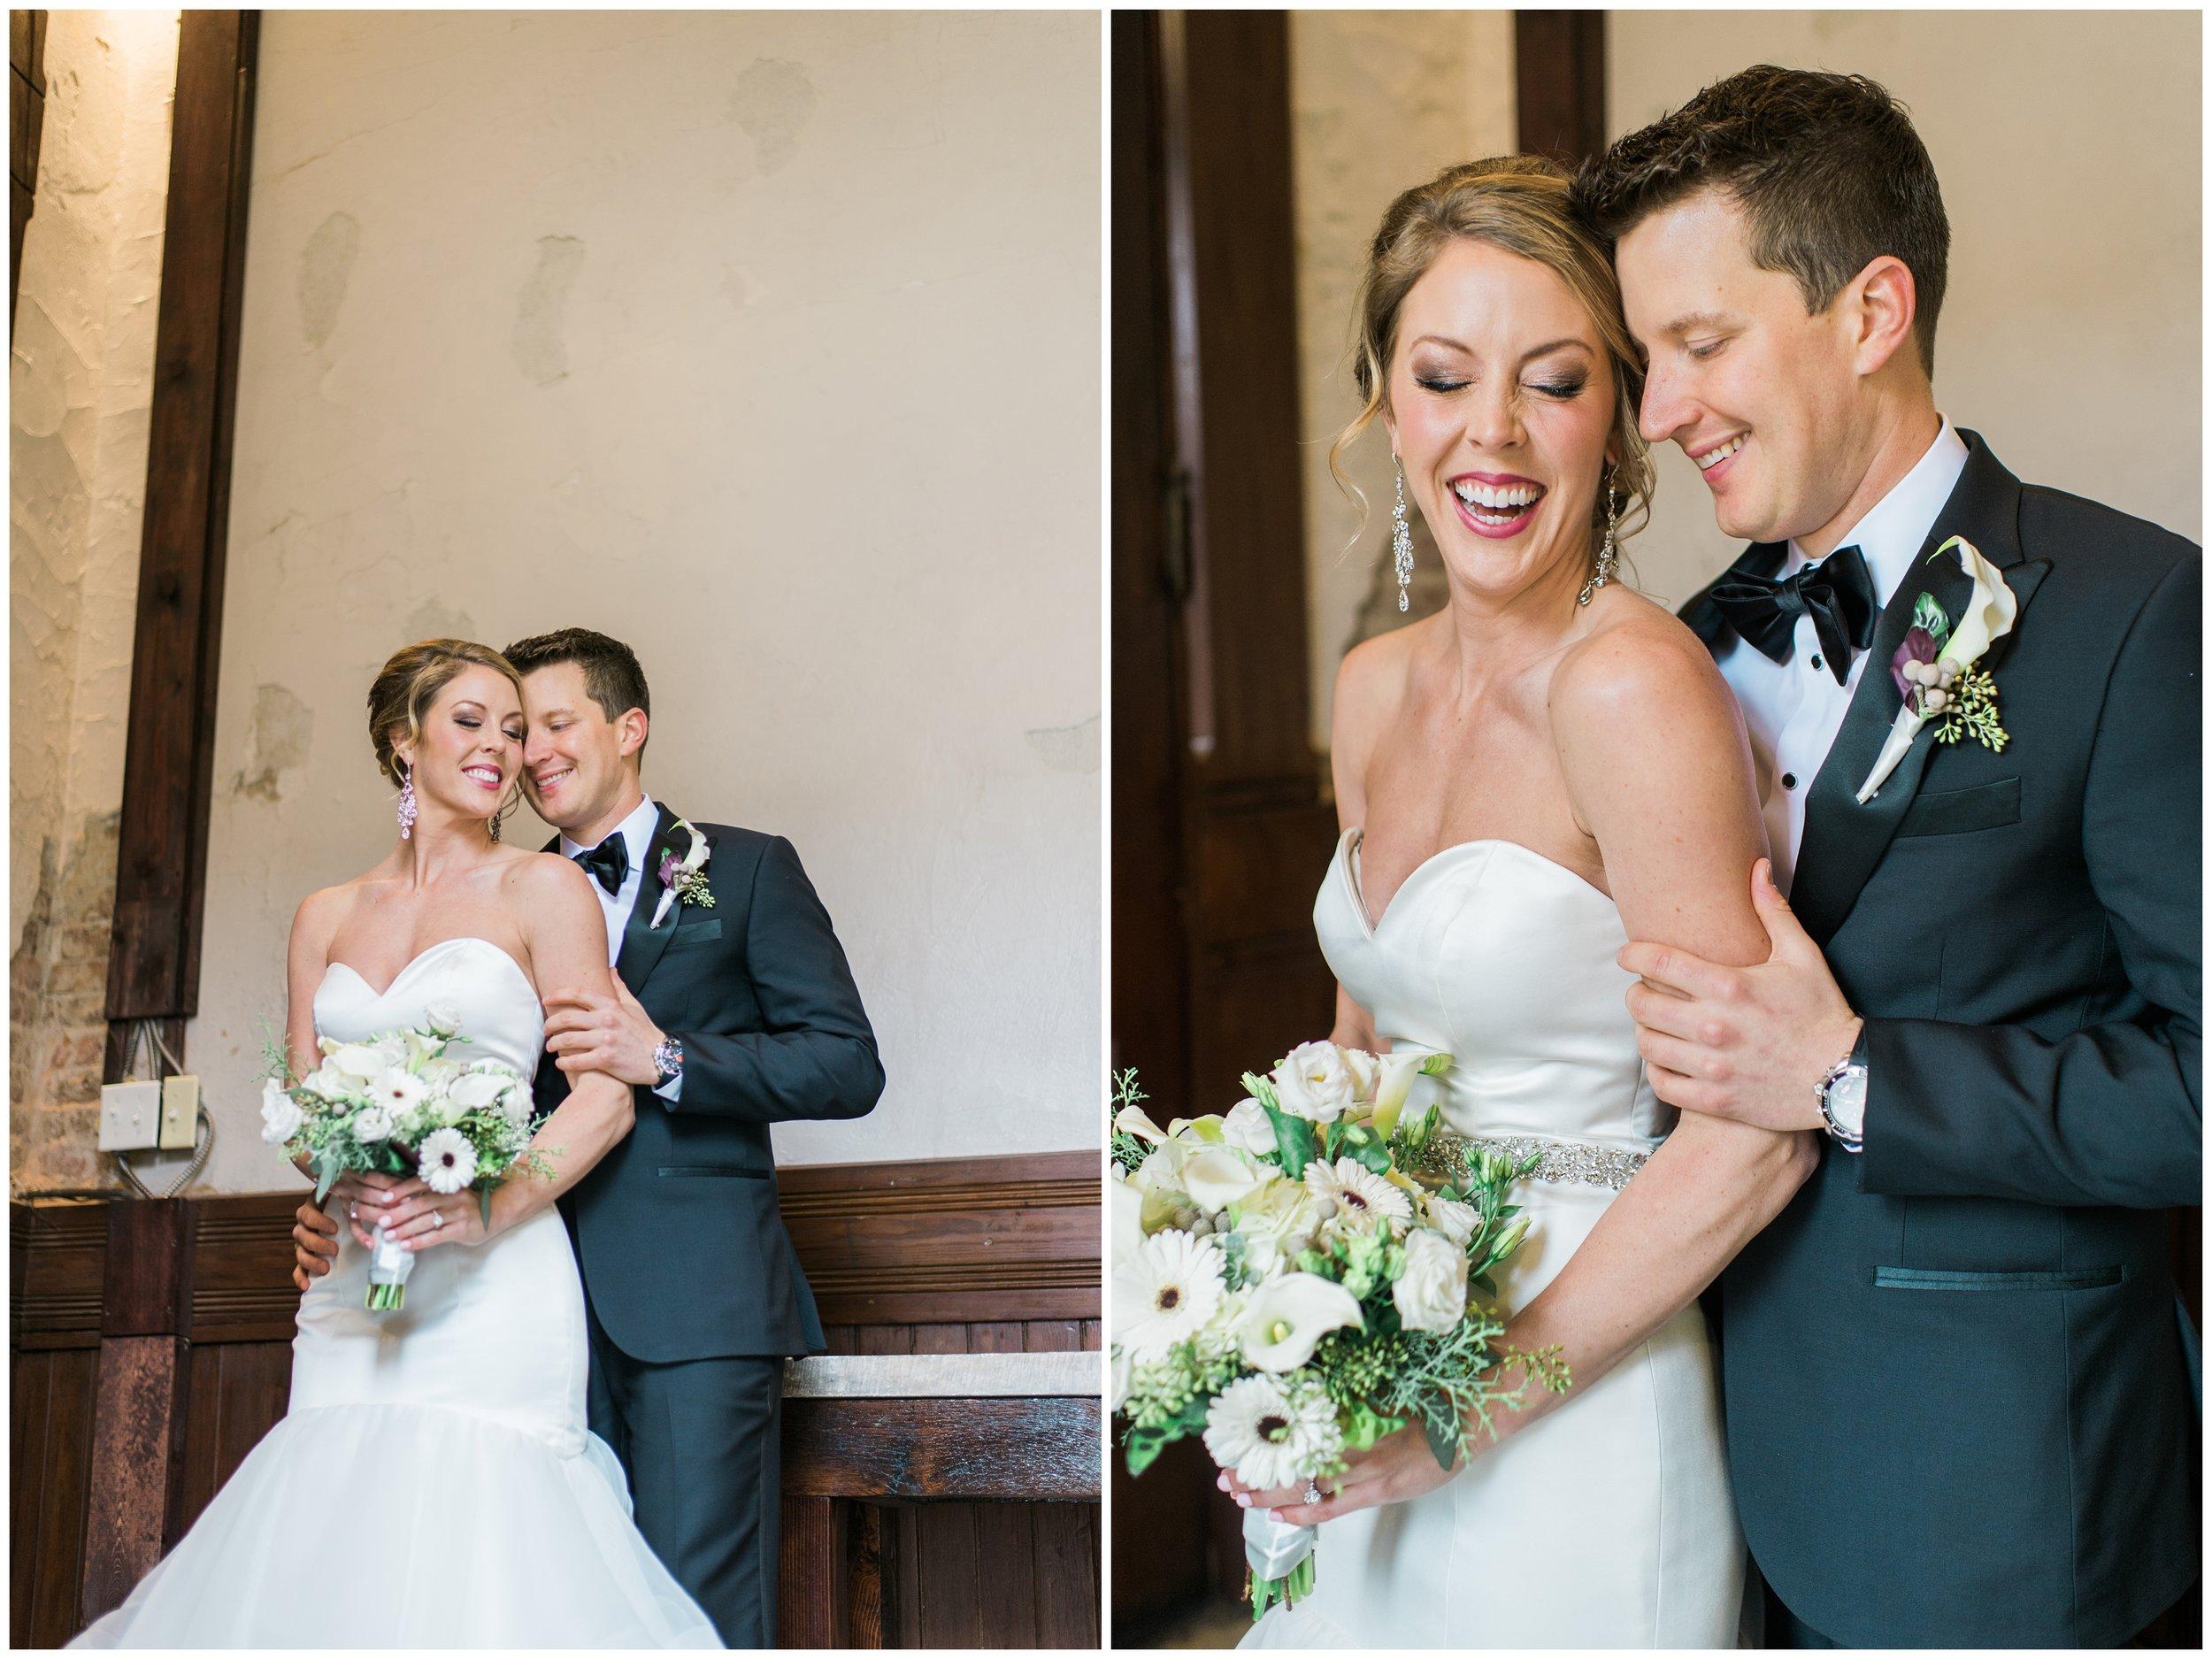 Rebecca_Bridges_Photography_Indianapolis_Wedding_Photographer_5800.jpg